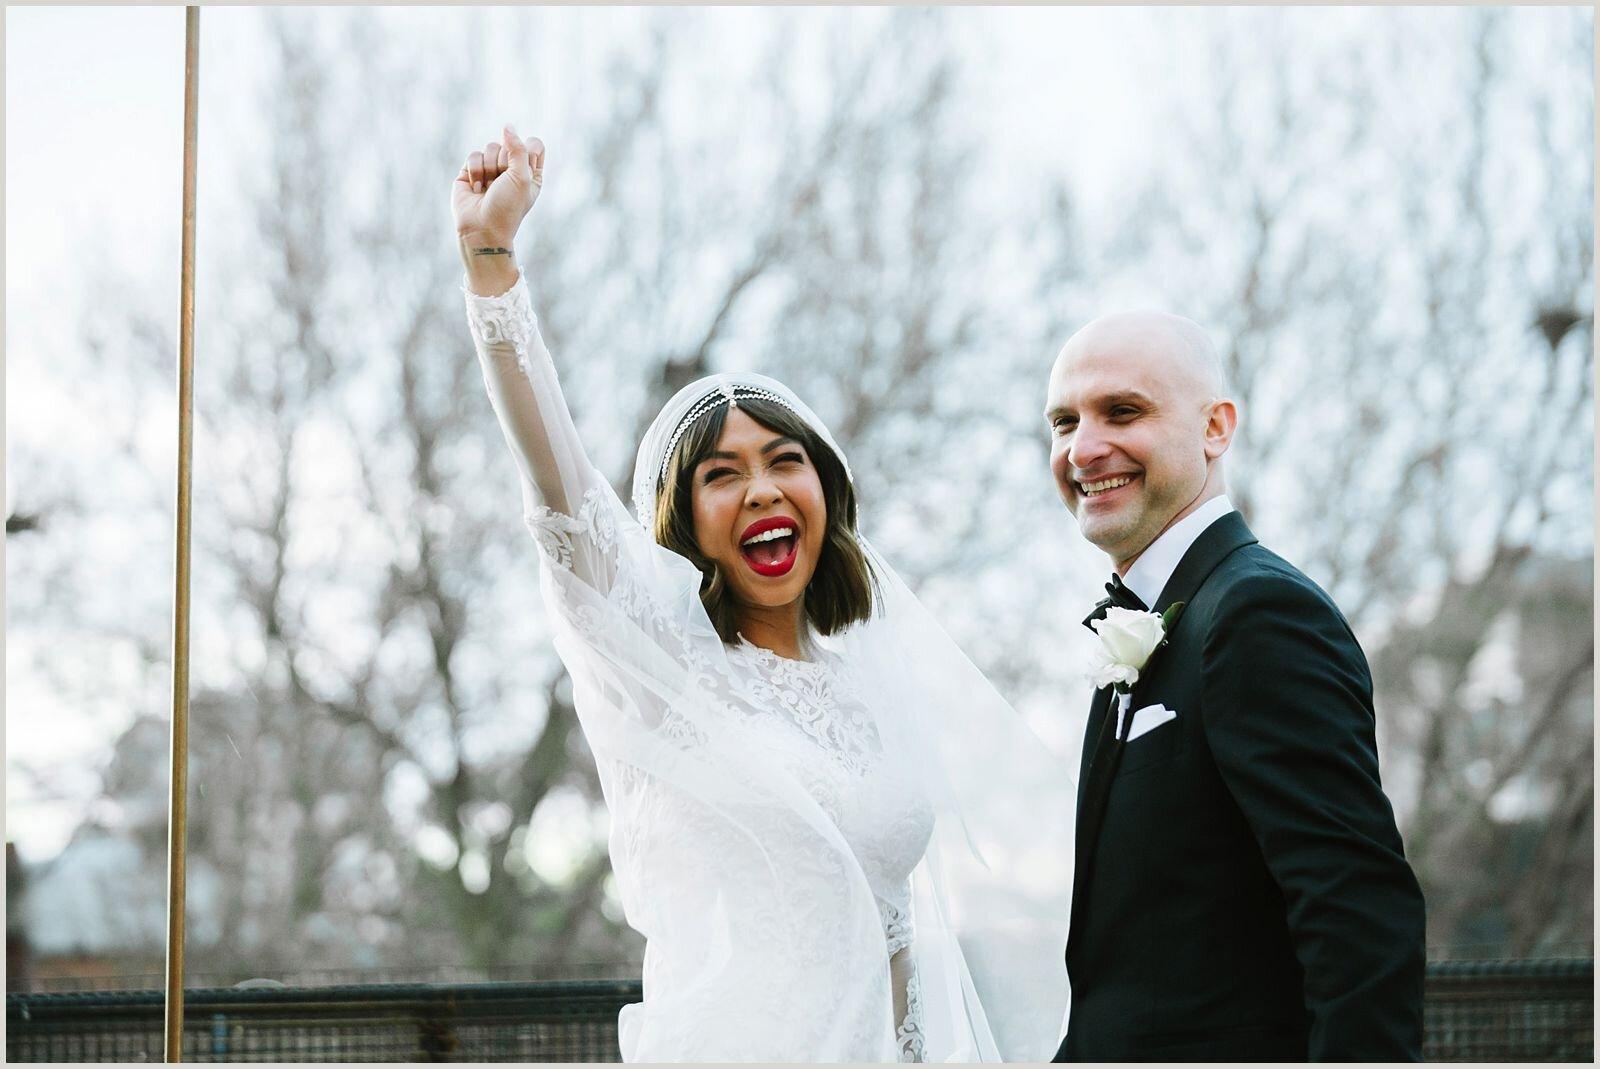 joseph_koprek_wedding_melbourne_the_prince_deck_0063.jpg